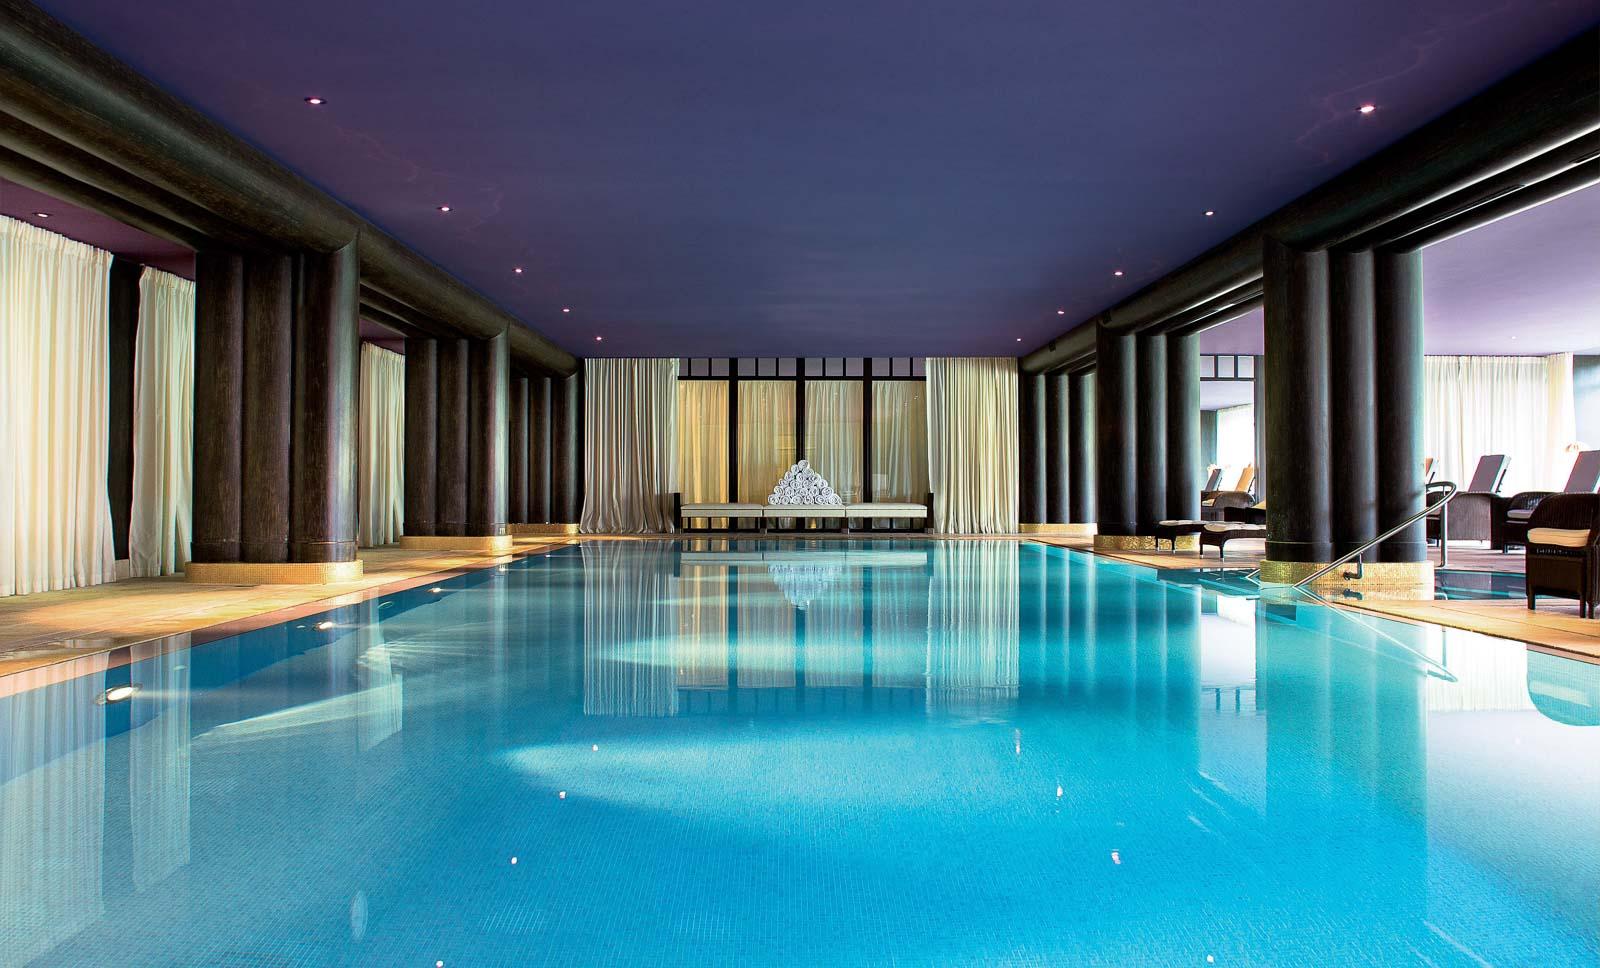 La Réserve Genève piscina interna